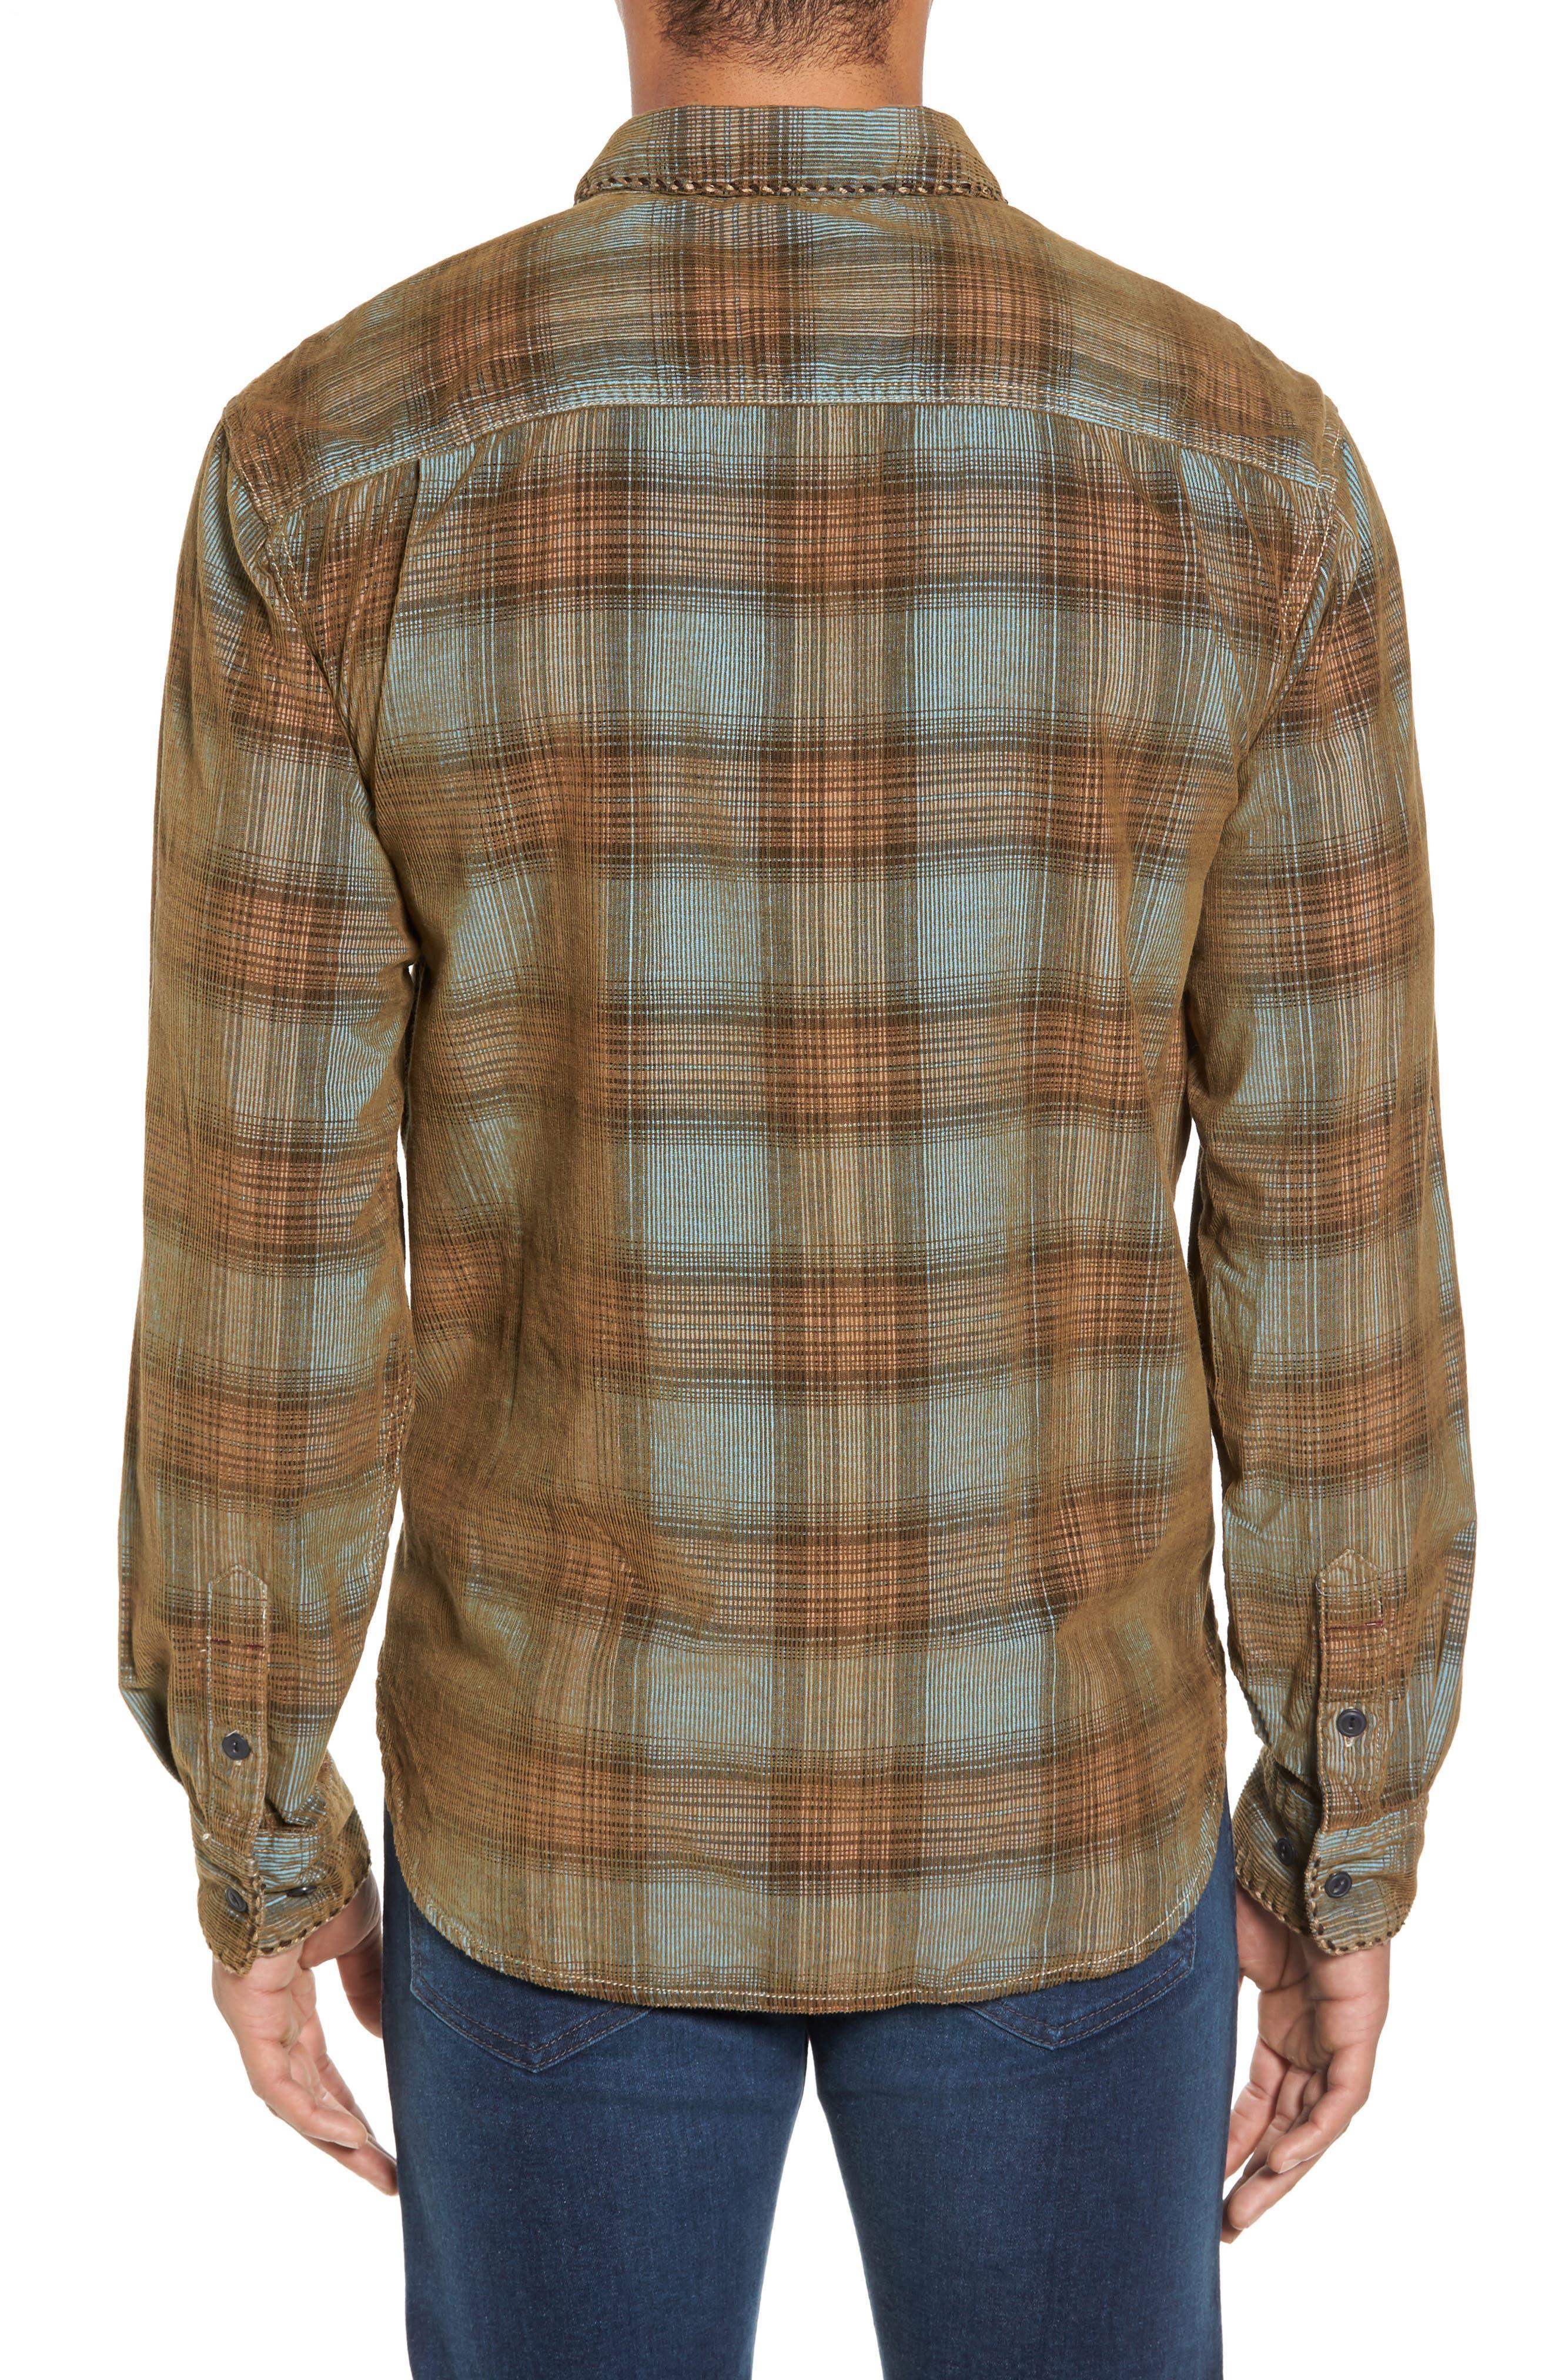 Alternate Image 2  - True Grit Ventura Vintage Slim Fit Plaid Corduroy Shirt